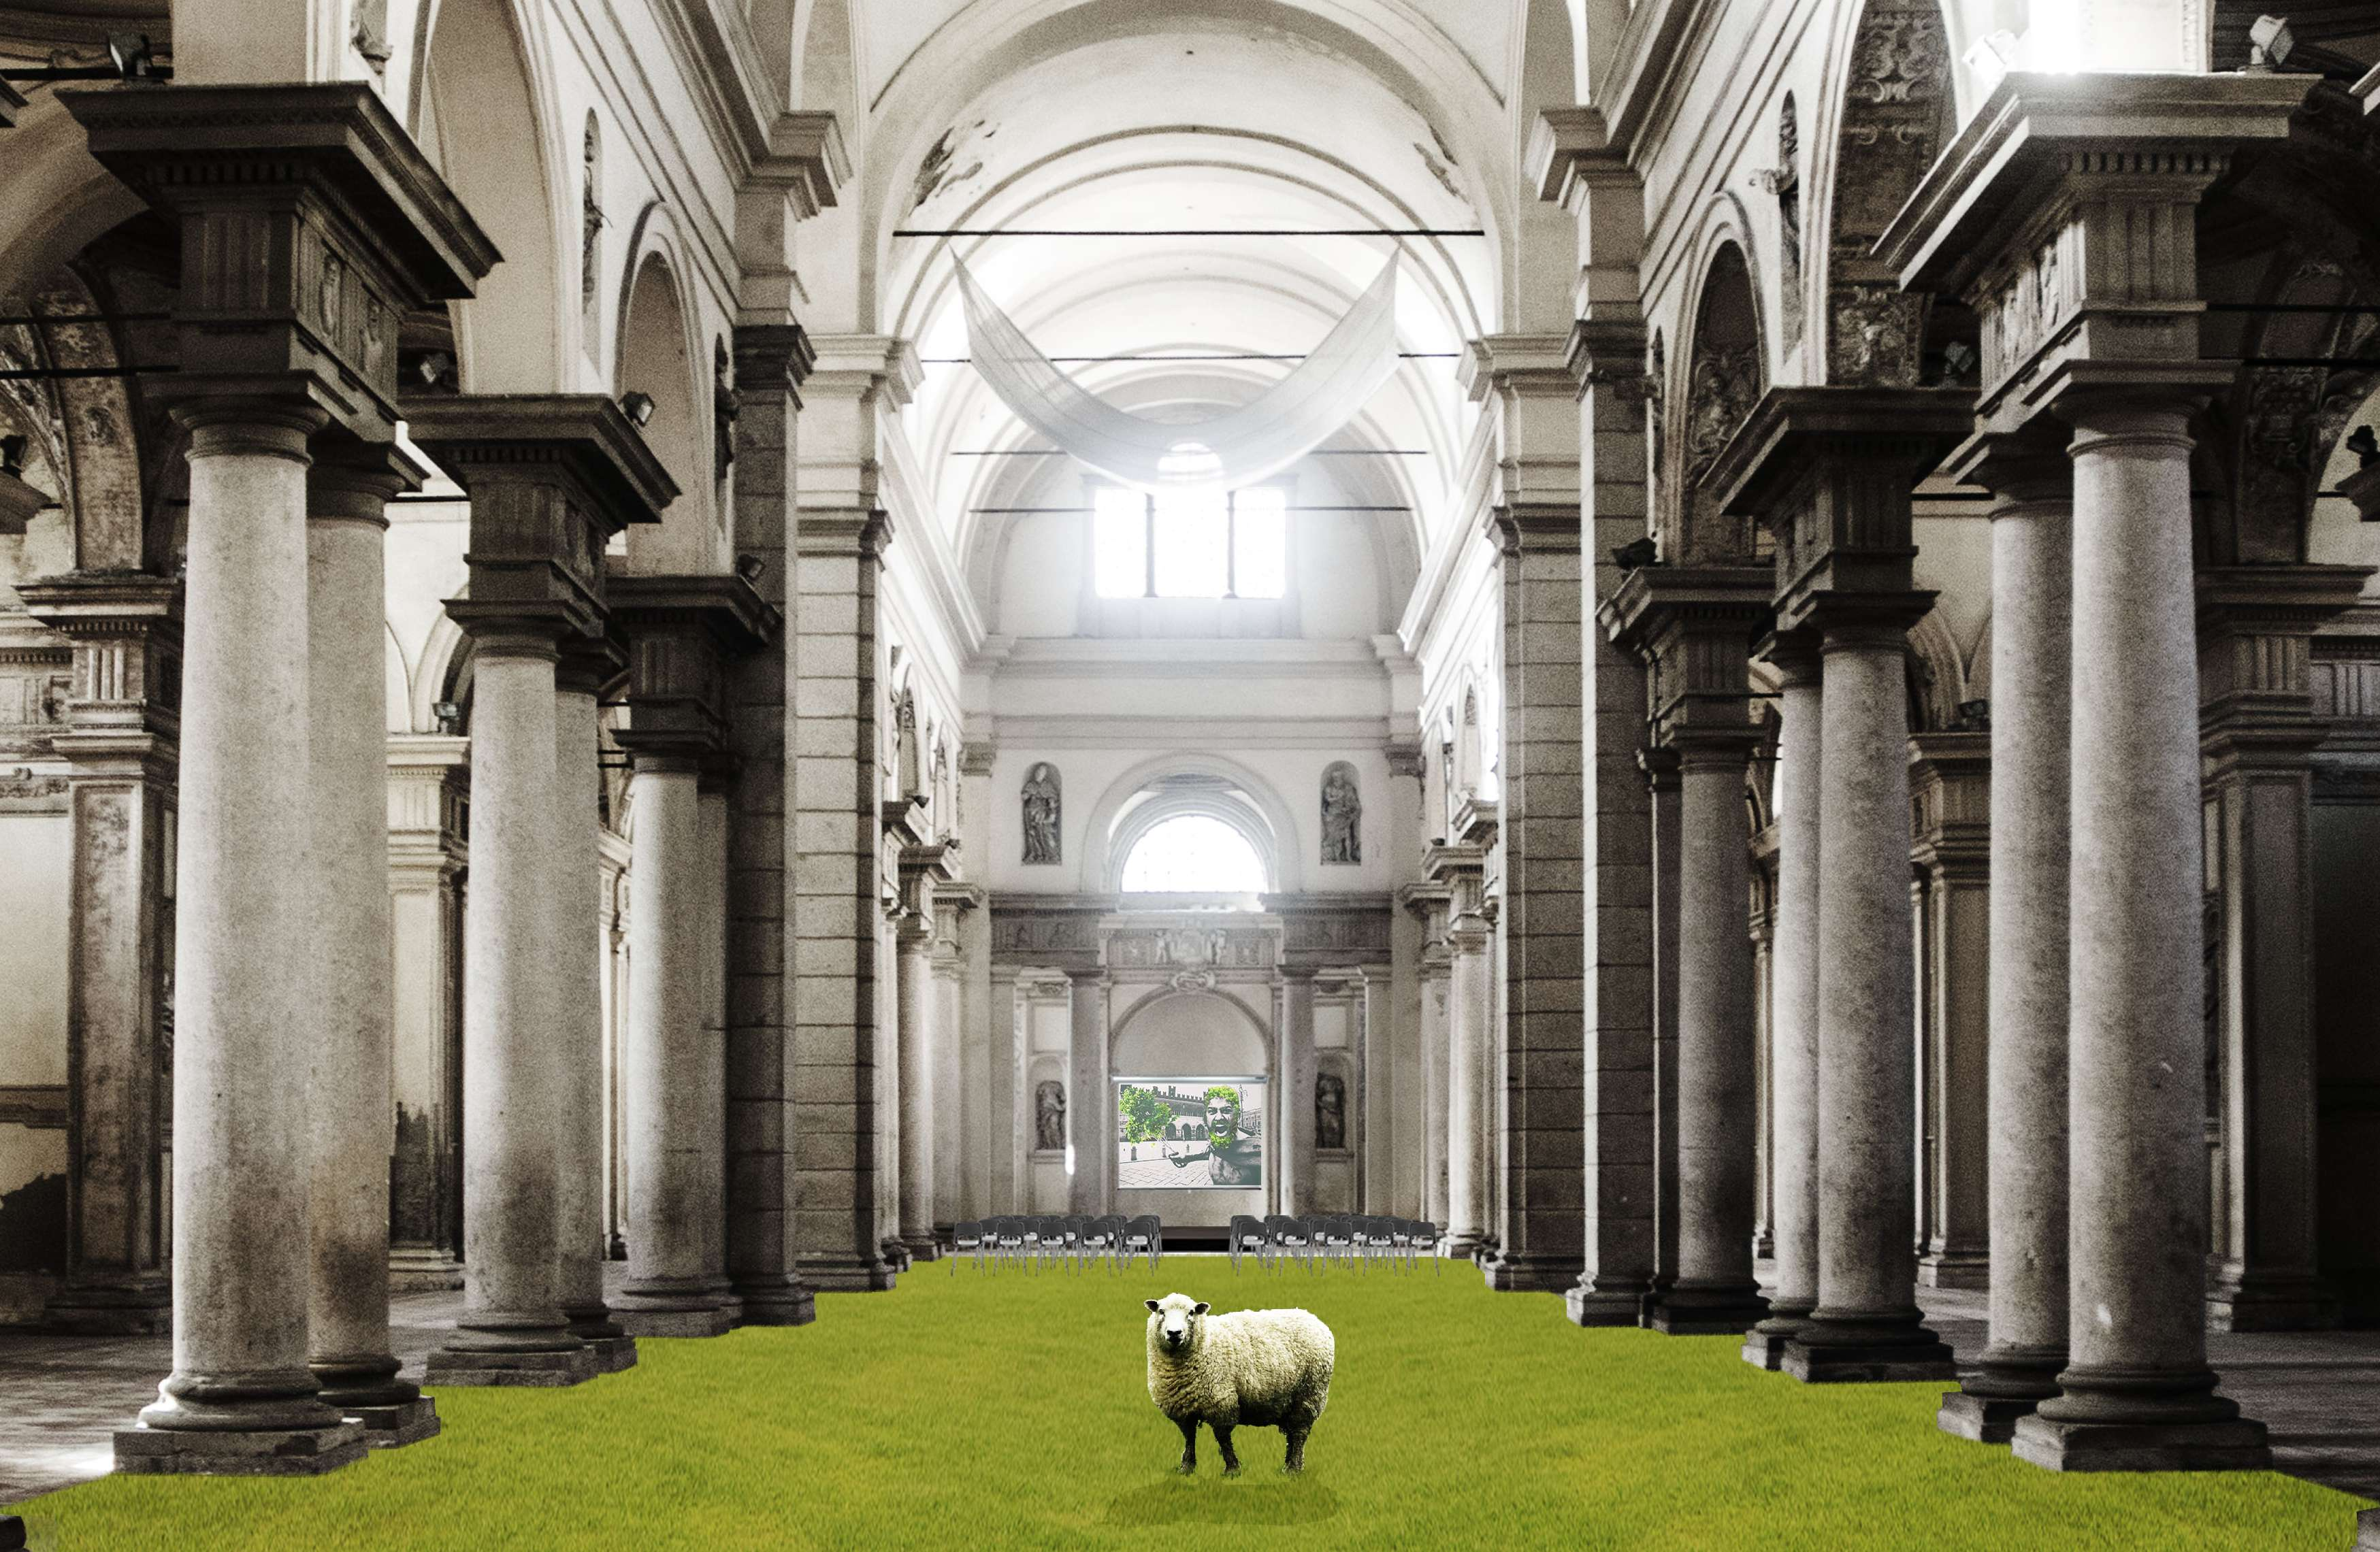 Piacenza diventa green per due giorni: week-end di natura in San'Agostino